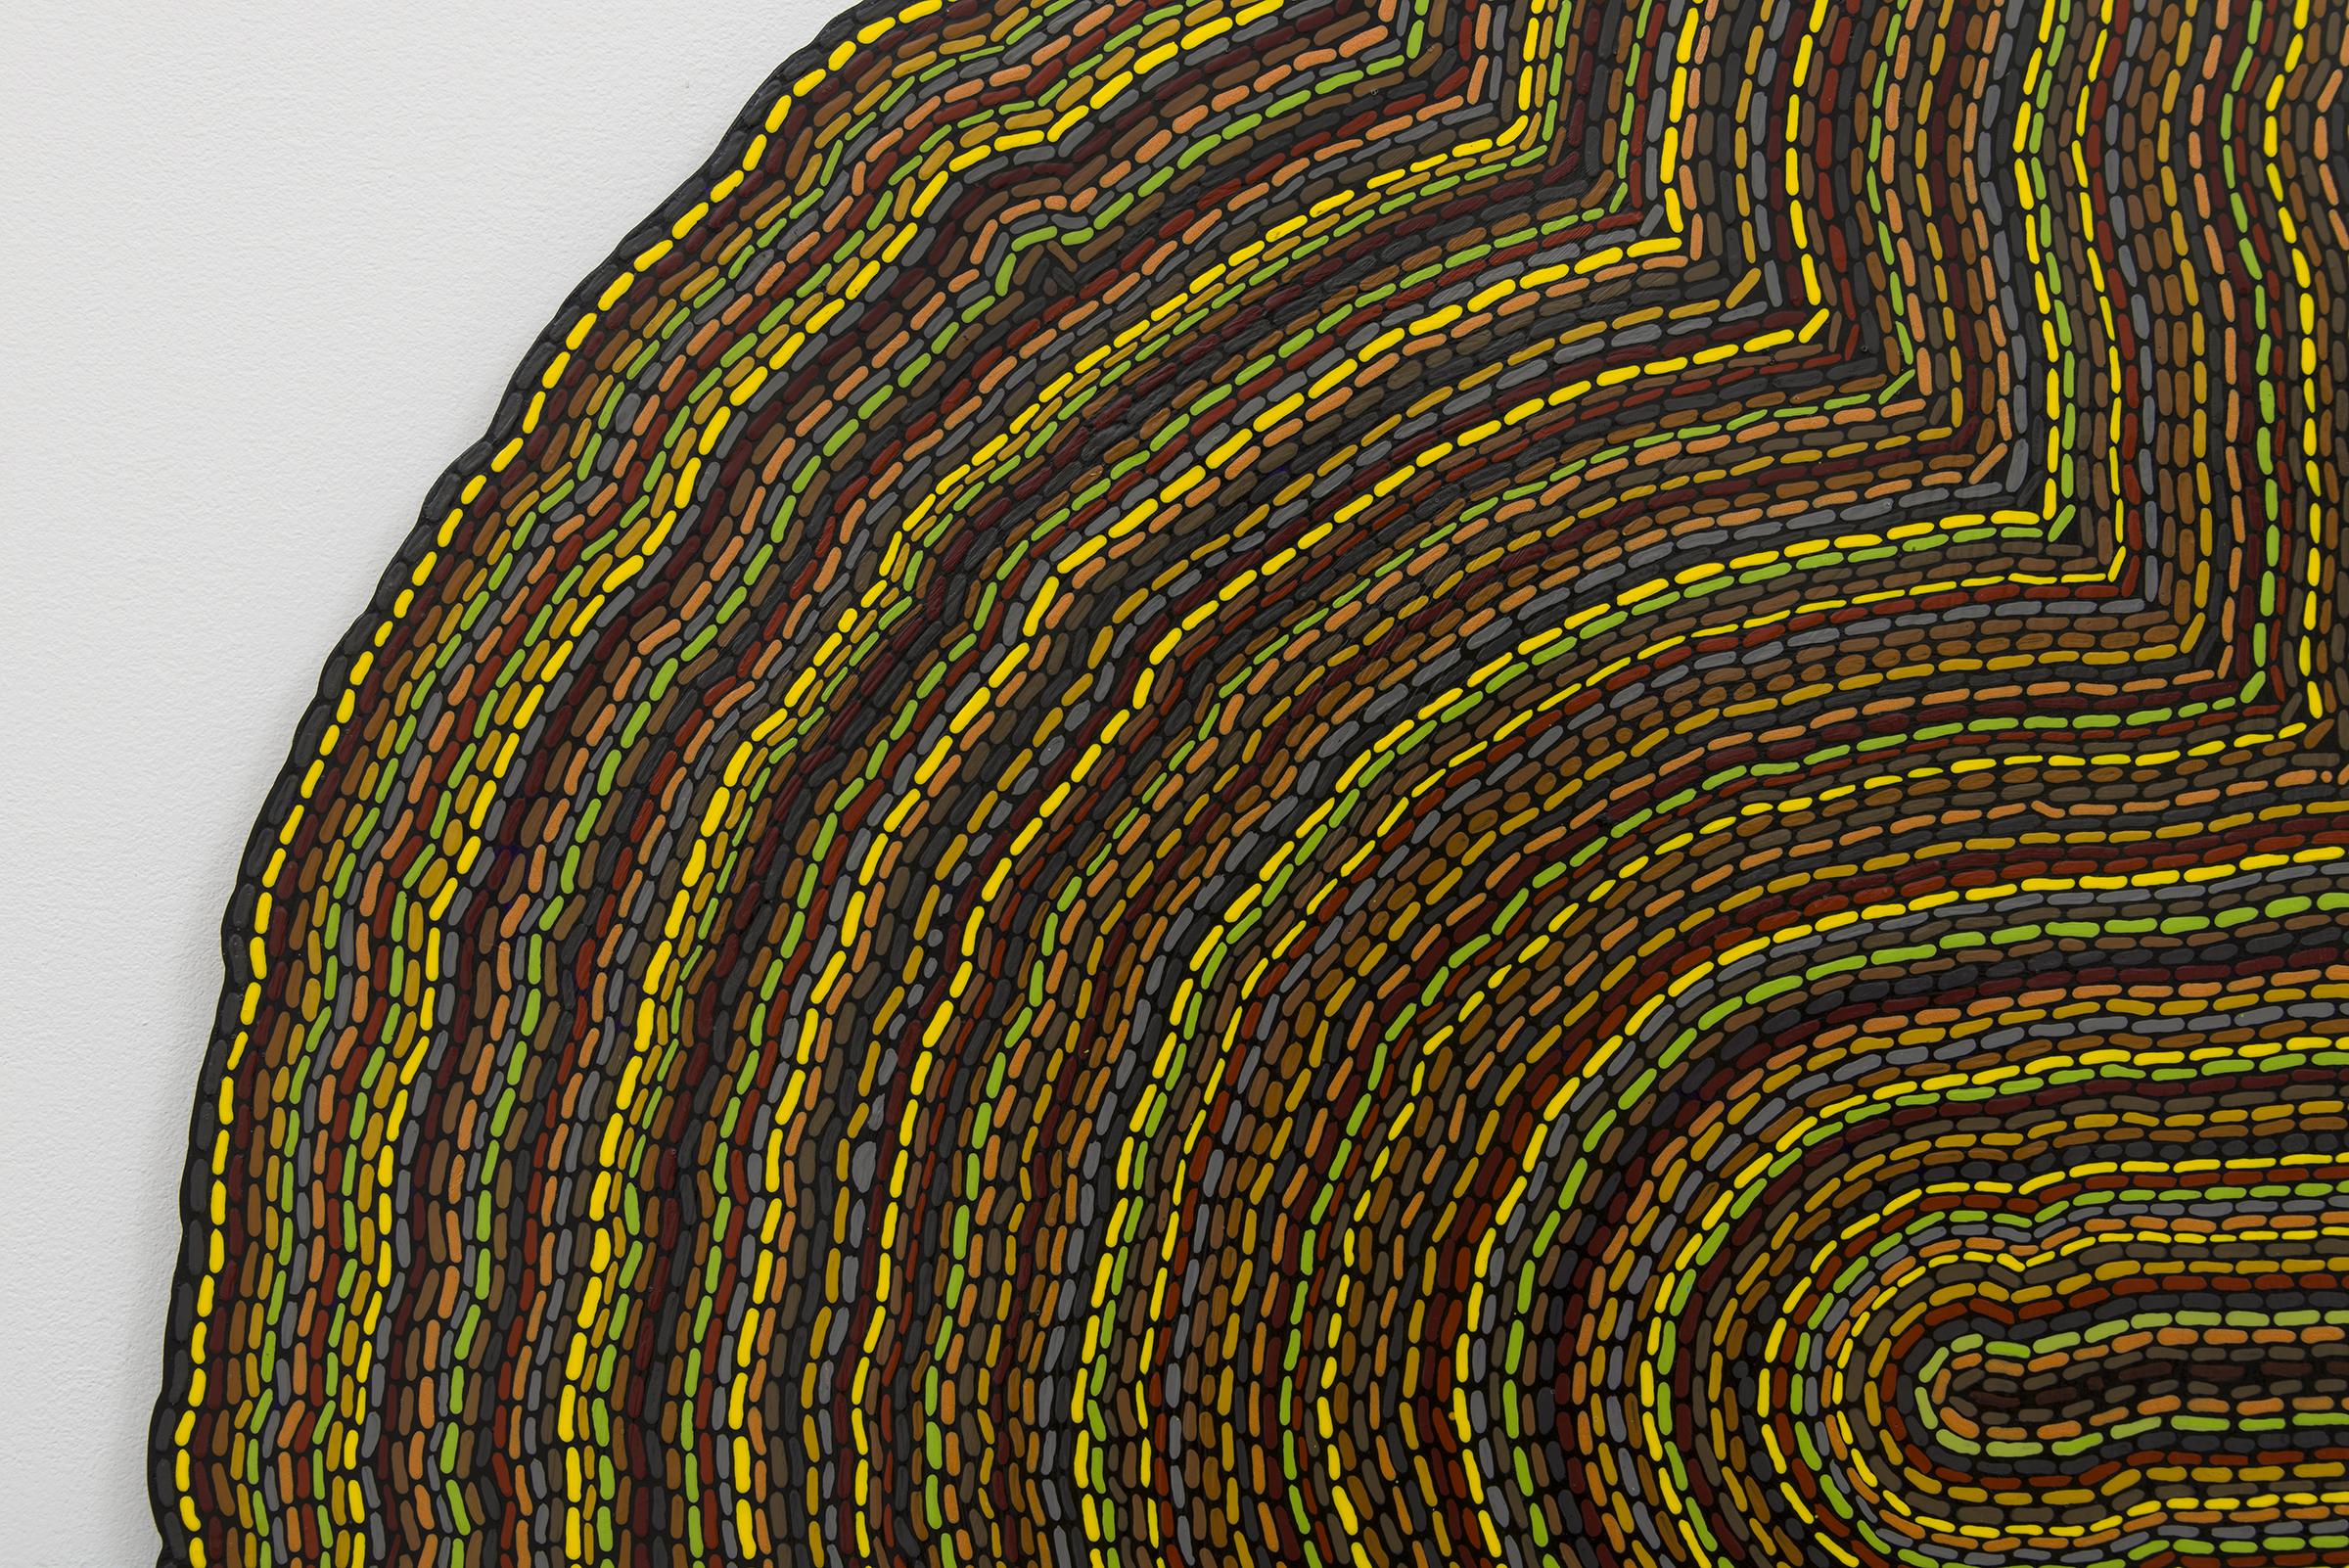 Roland Thompson, Tremble  (detail),2003, acrylic on aluminum, 48 x 48 in